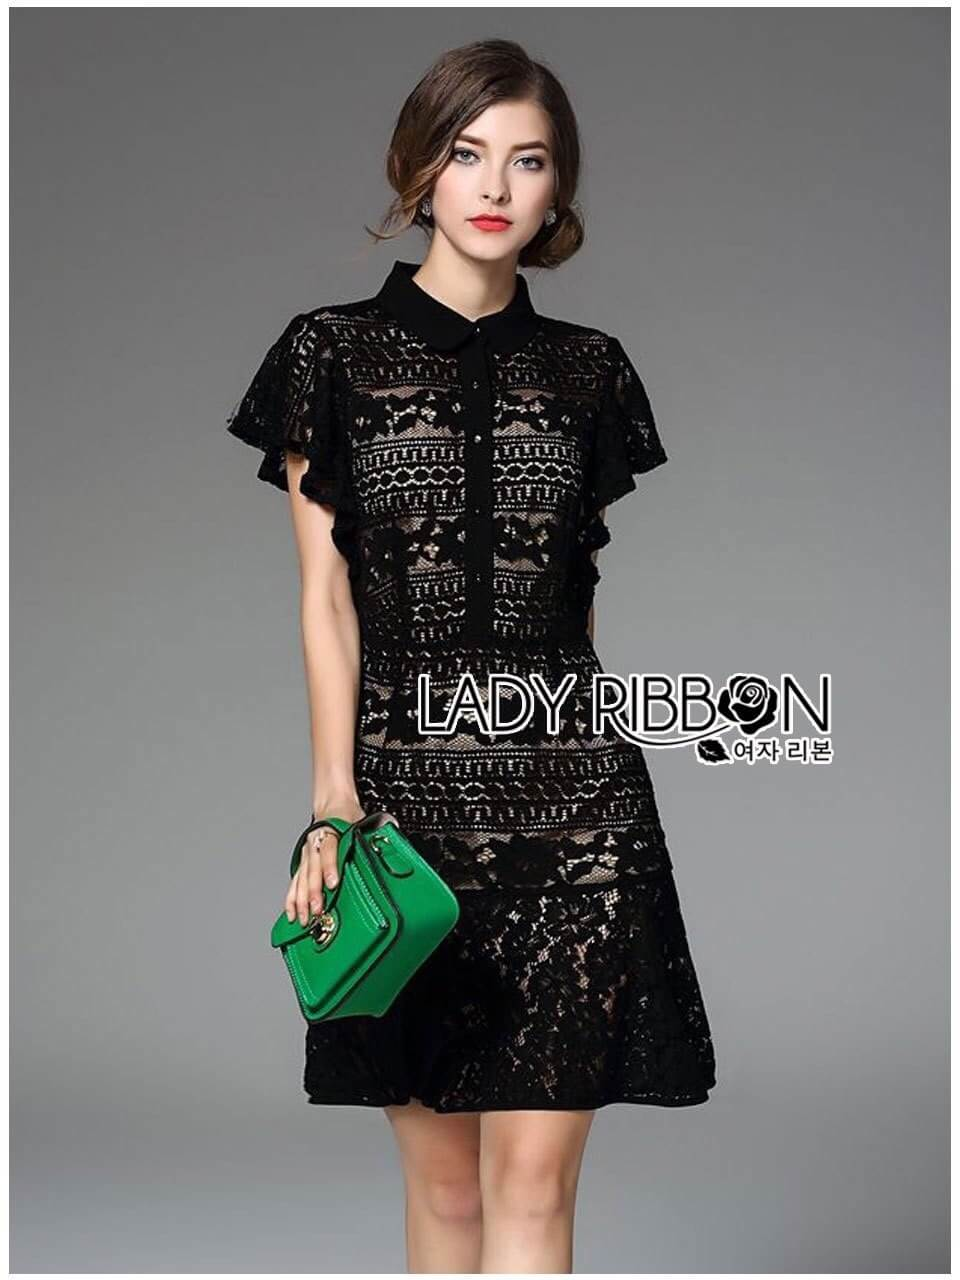 &#x1F380 Lady Ribbon's Made &#x1F380 Lady Christine Sweet Feminine Ruffle-Sleeve Lace Shirt Dress